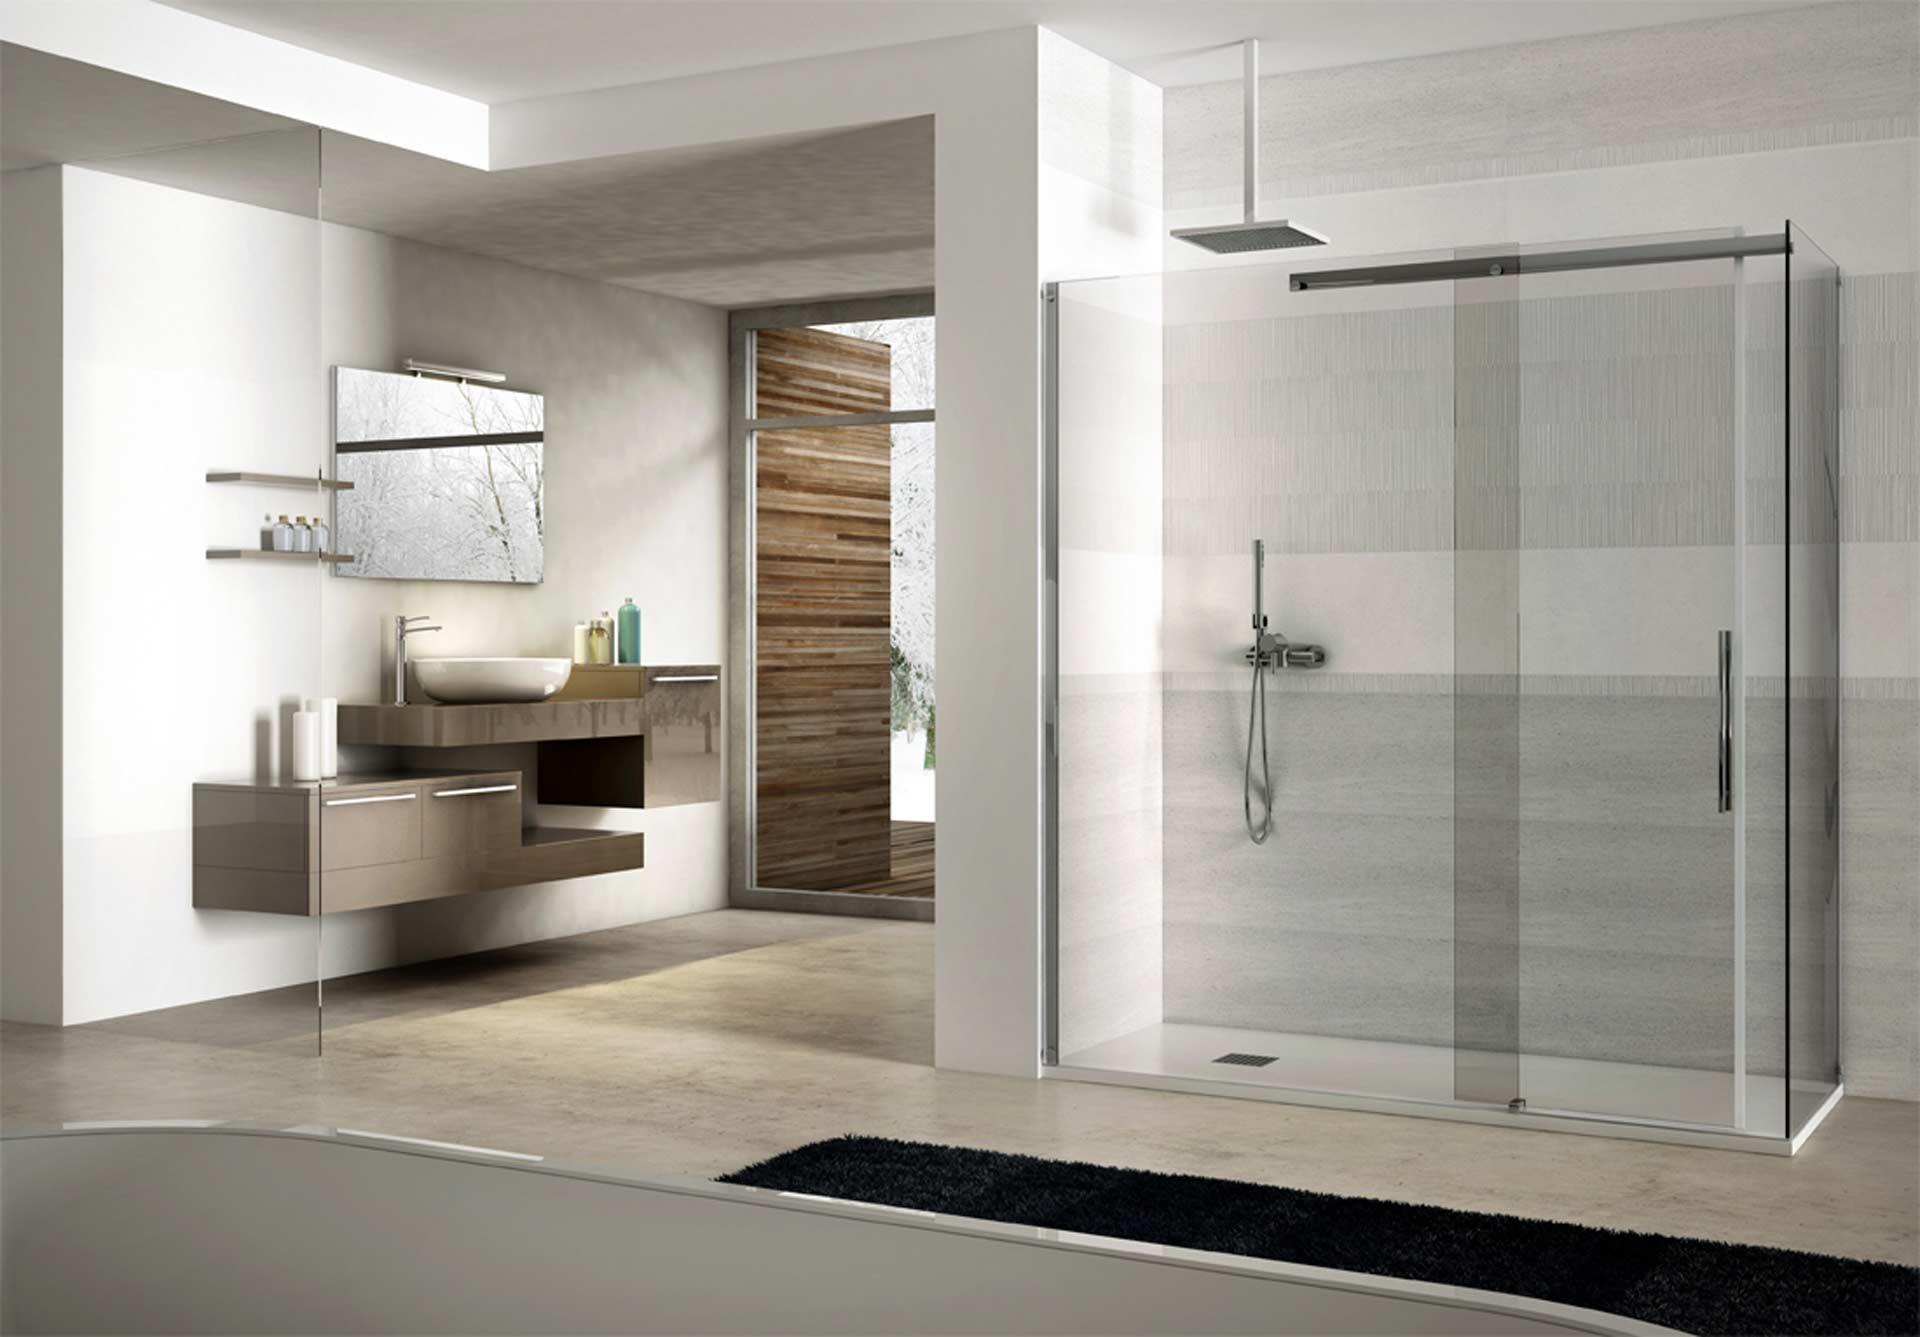 Bagno moderno doccia - Vasche da bagno roma ...